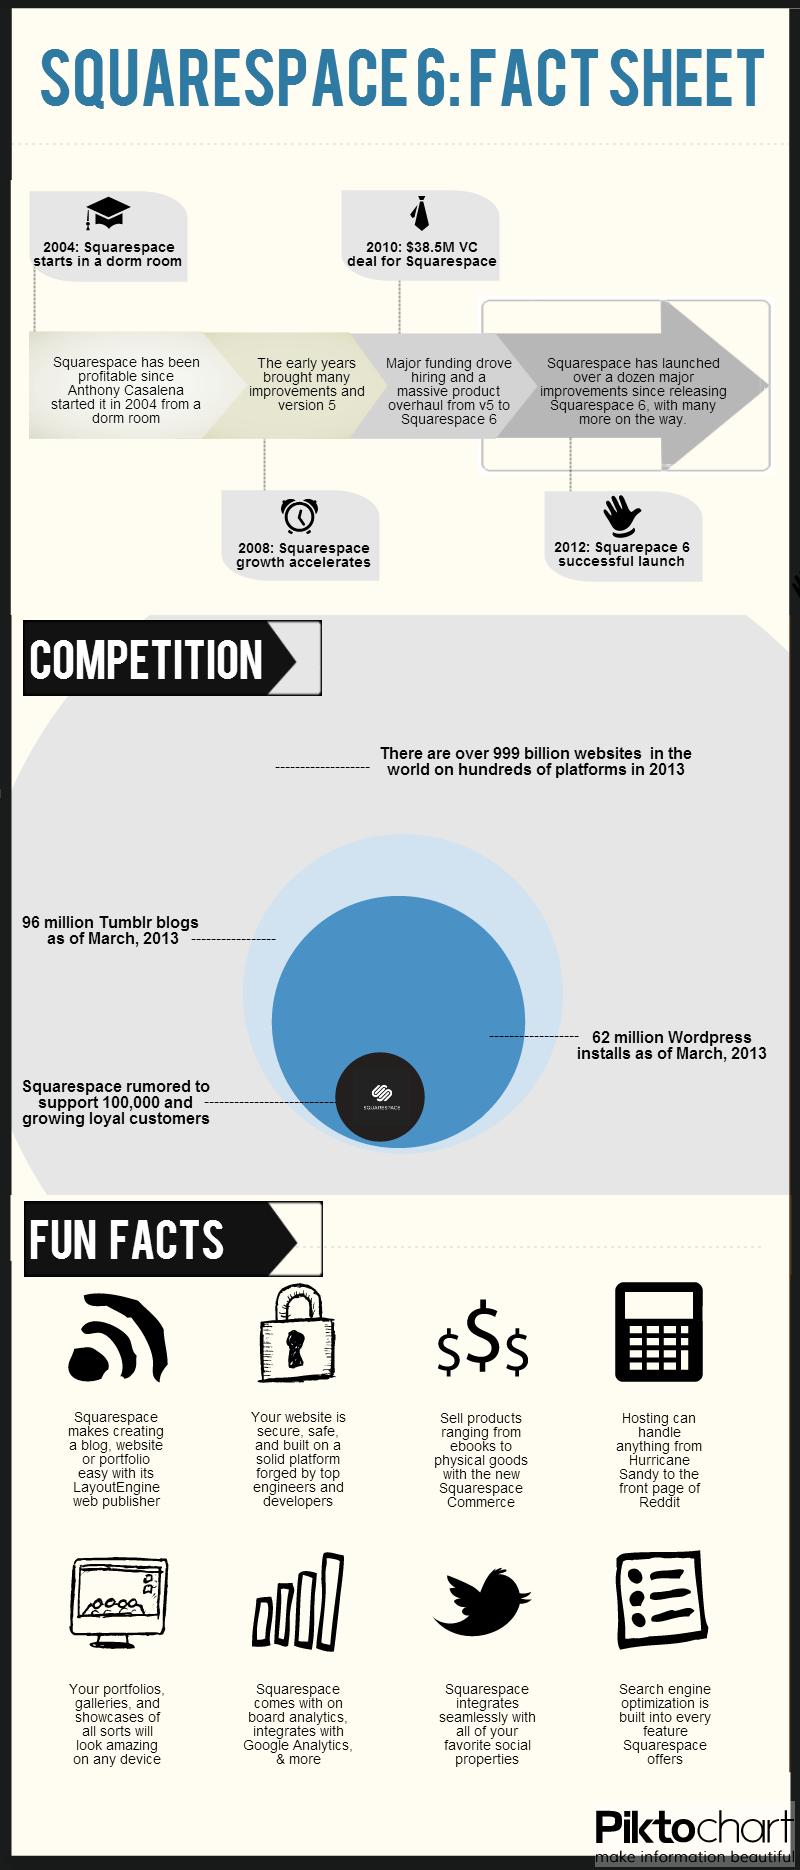 Squarespace 6 infographic